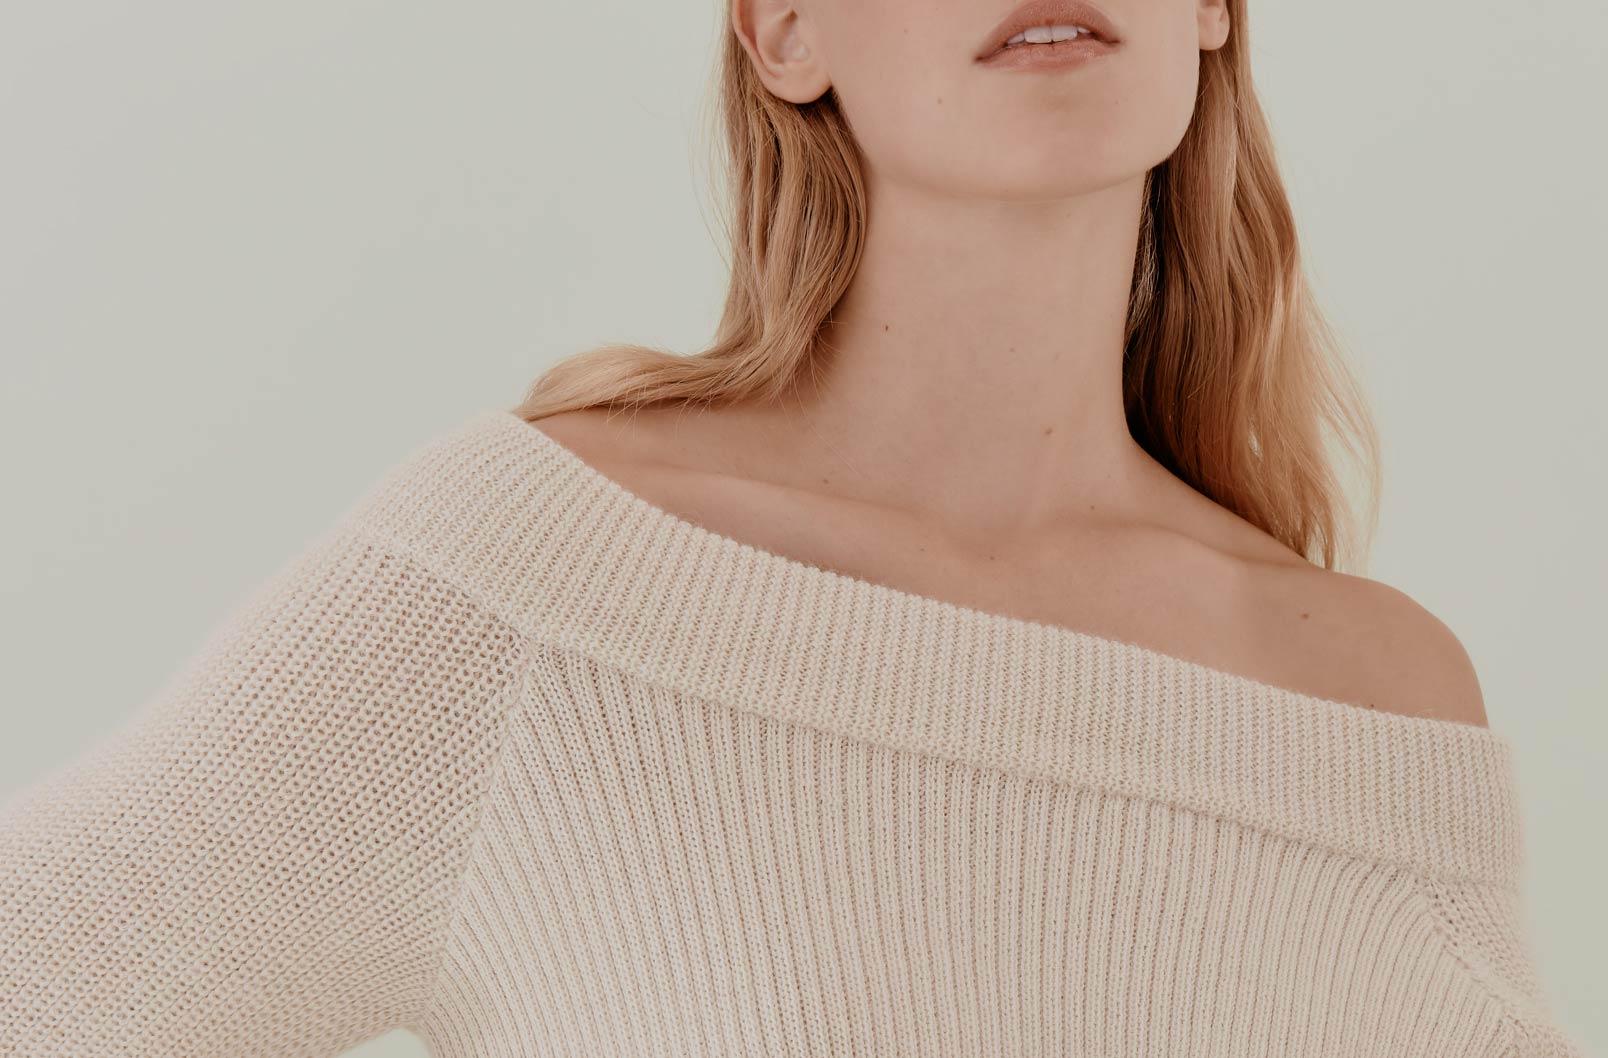 Detail image showing open neckline of Alpaca Off-the-Shoulder Sweater